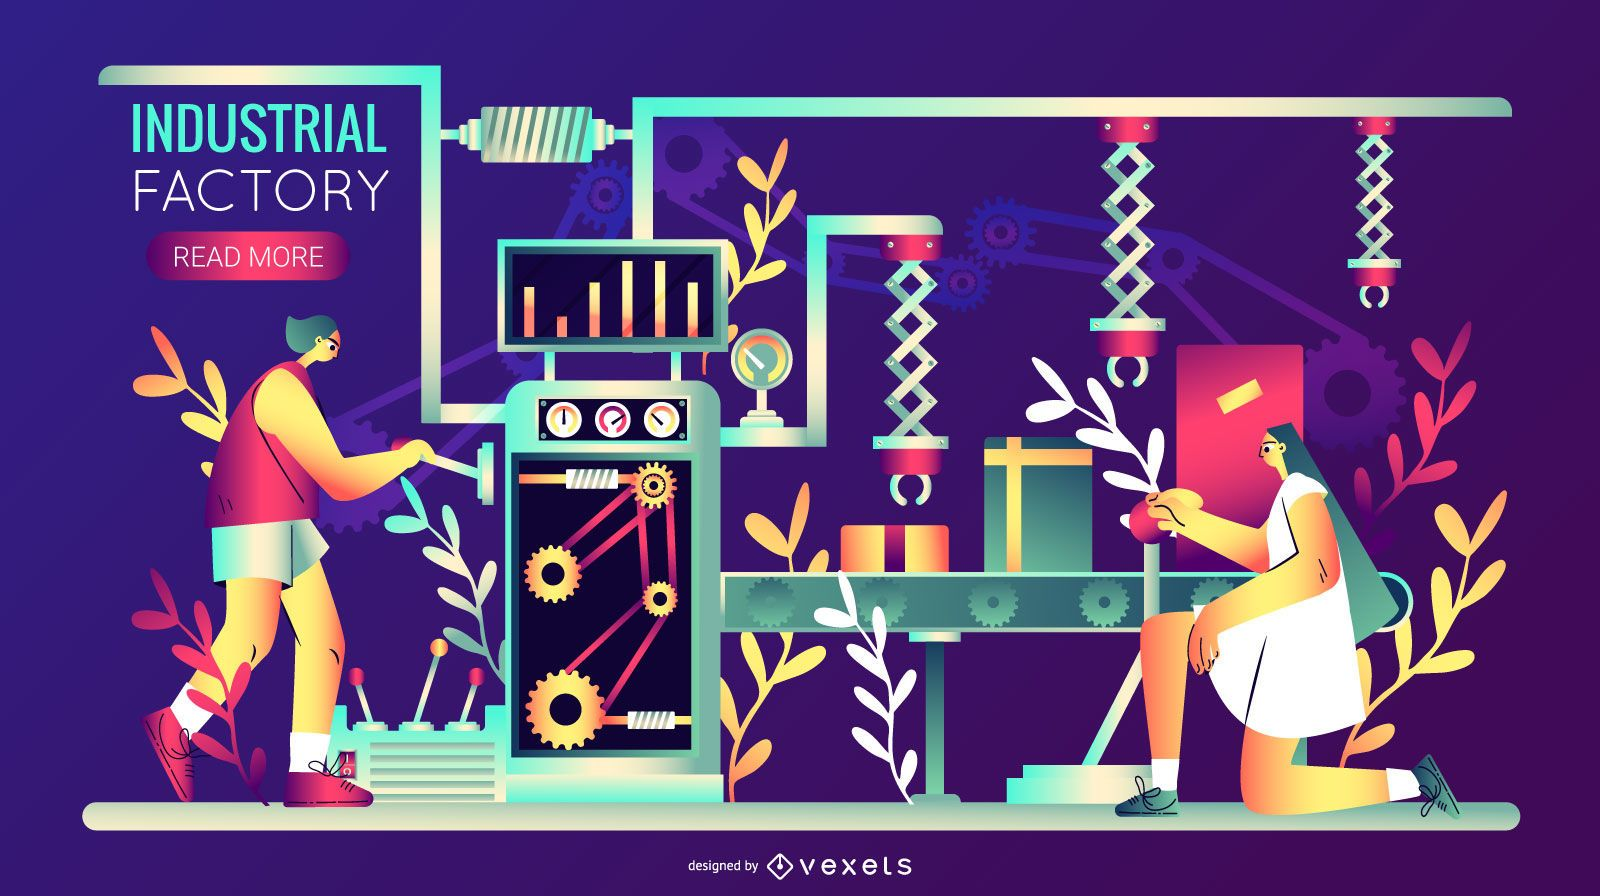 Industrial Factory Illustration Design